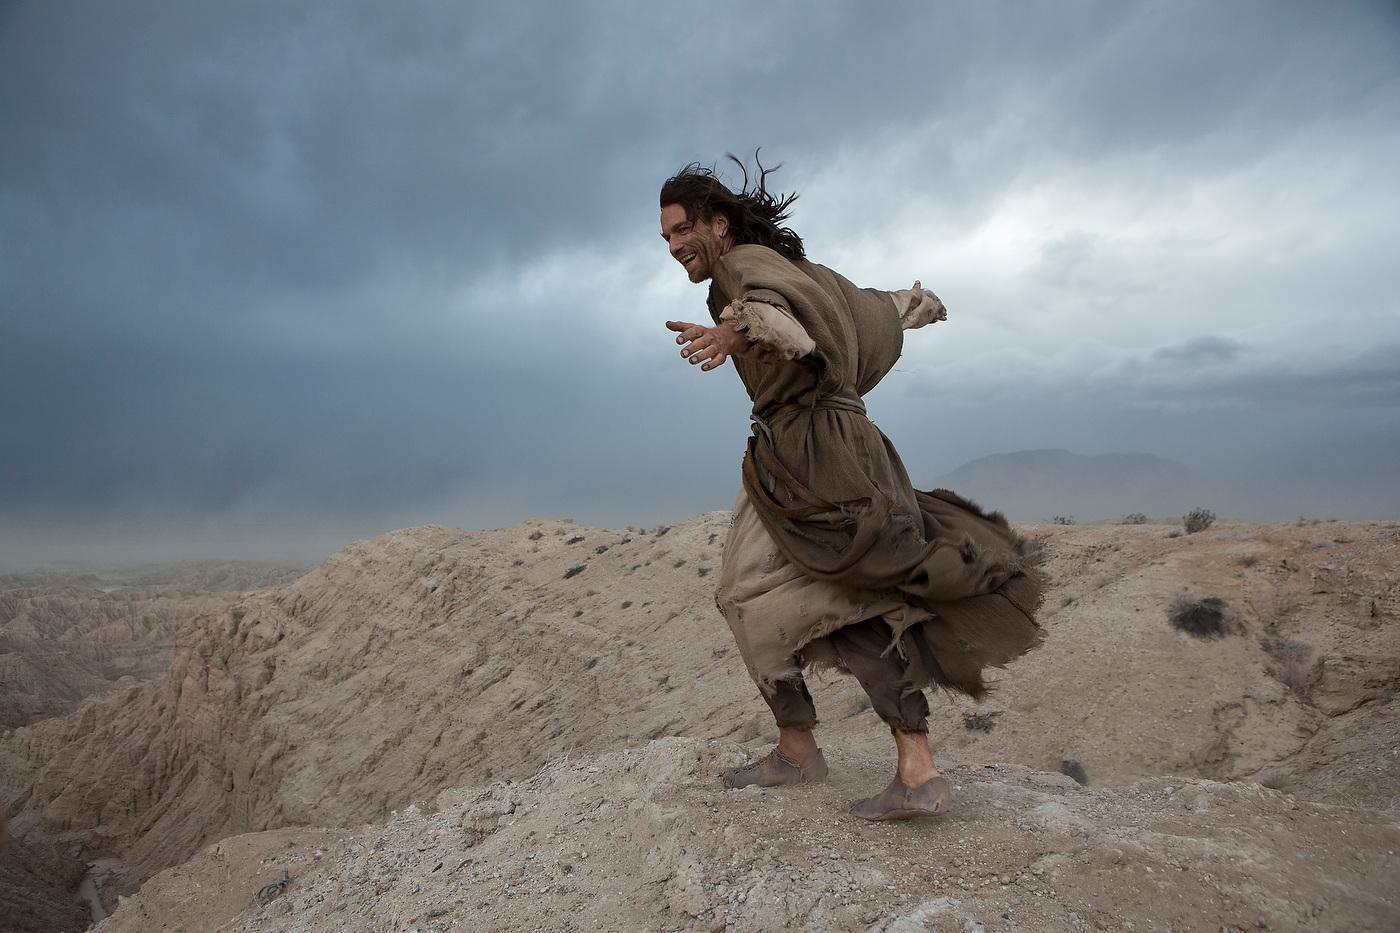 LAST DAYS IN THE DESERT. Directed by Rodrigo Garcia, DP Emmanuel Lubezki. Ewan McGregor | Tye Sheridan | Ciarán Hinds | Ayelet Zurer.